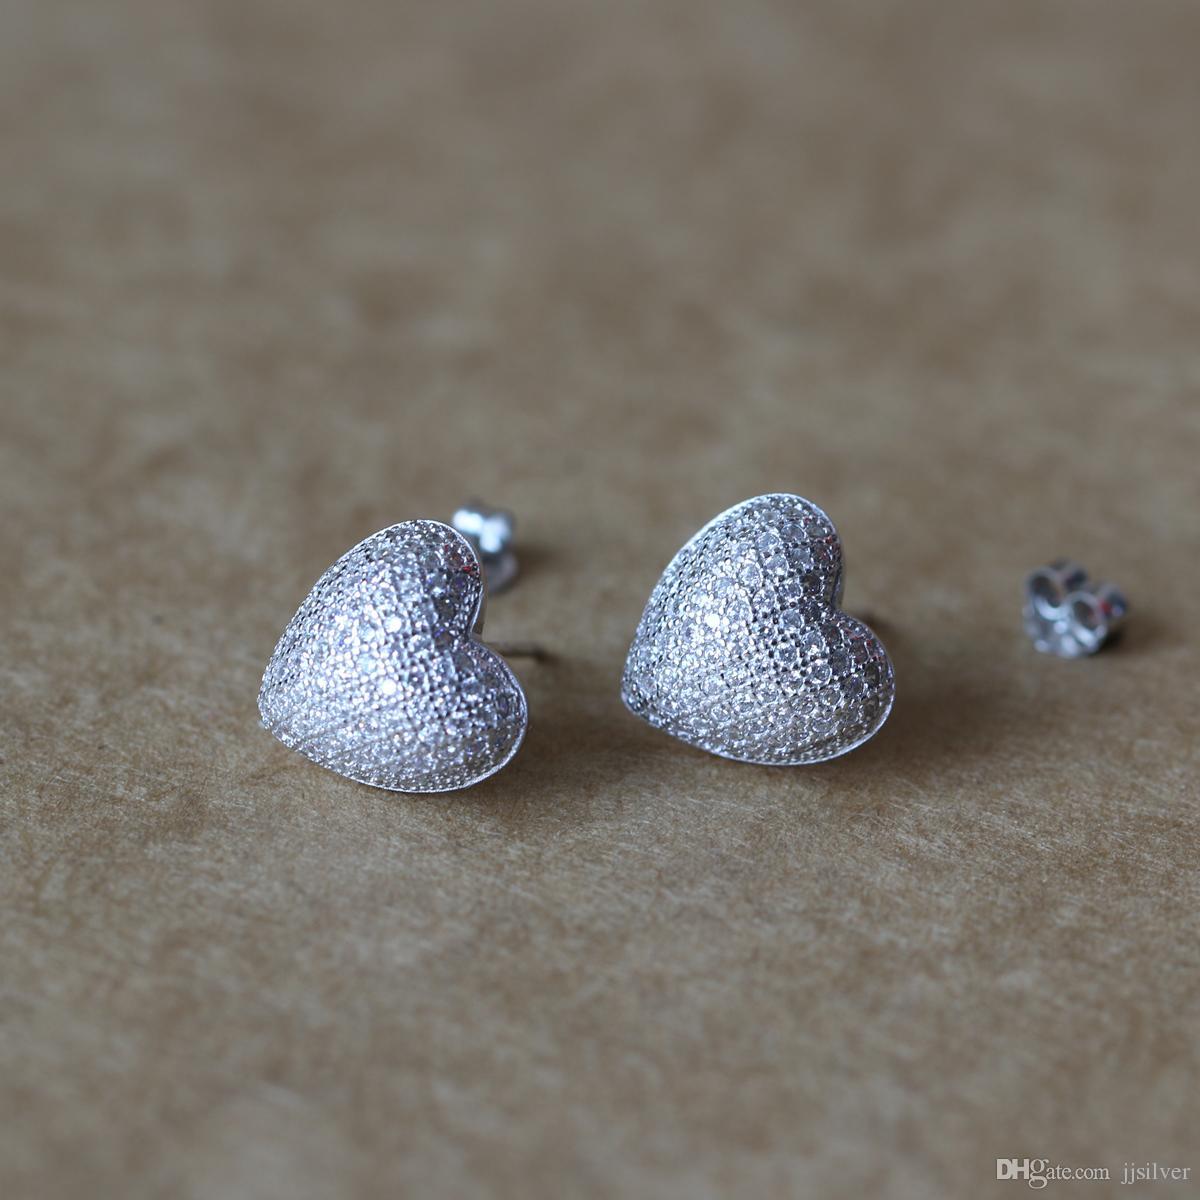 100% 925 Sterling Silver Earrings Jewelry Fashion Tiny CZ Pave Crystal Heart Stud Earrings Gift For Women Girls Kids Lady Fine Jewelry